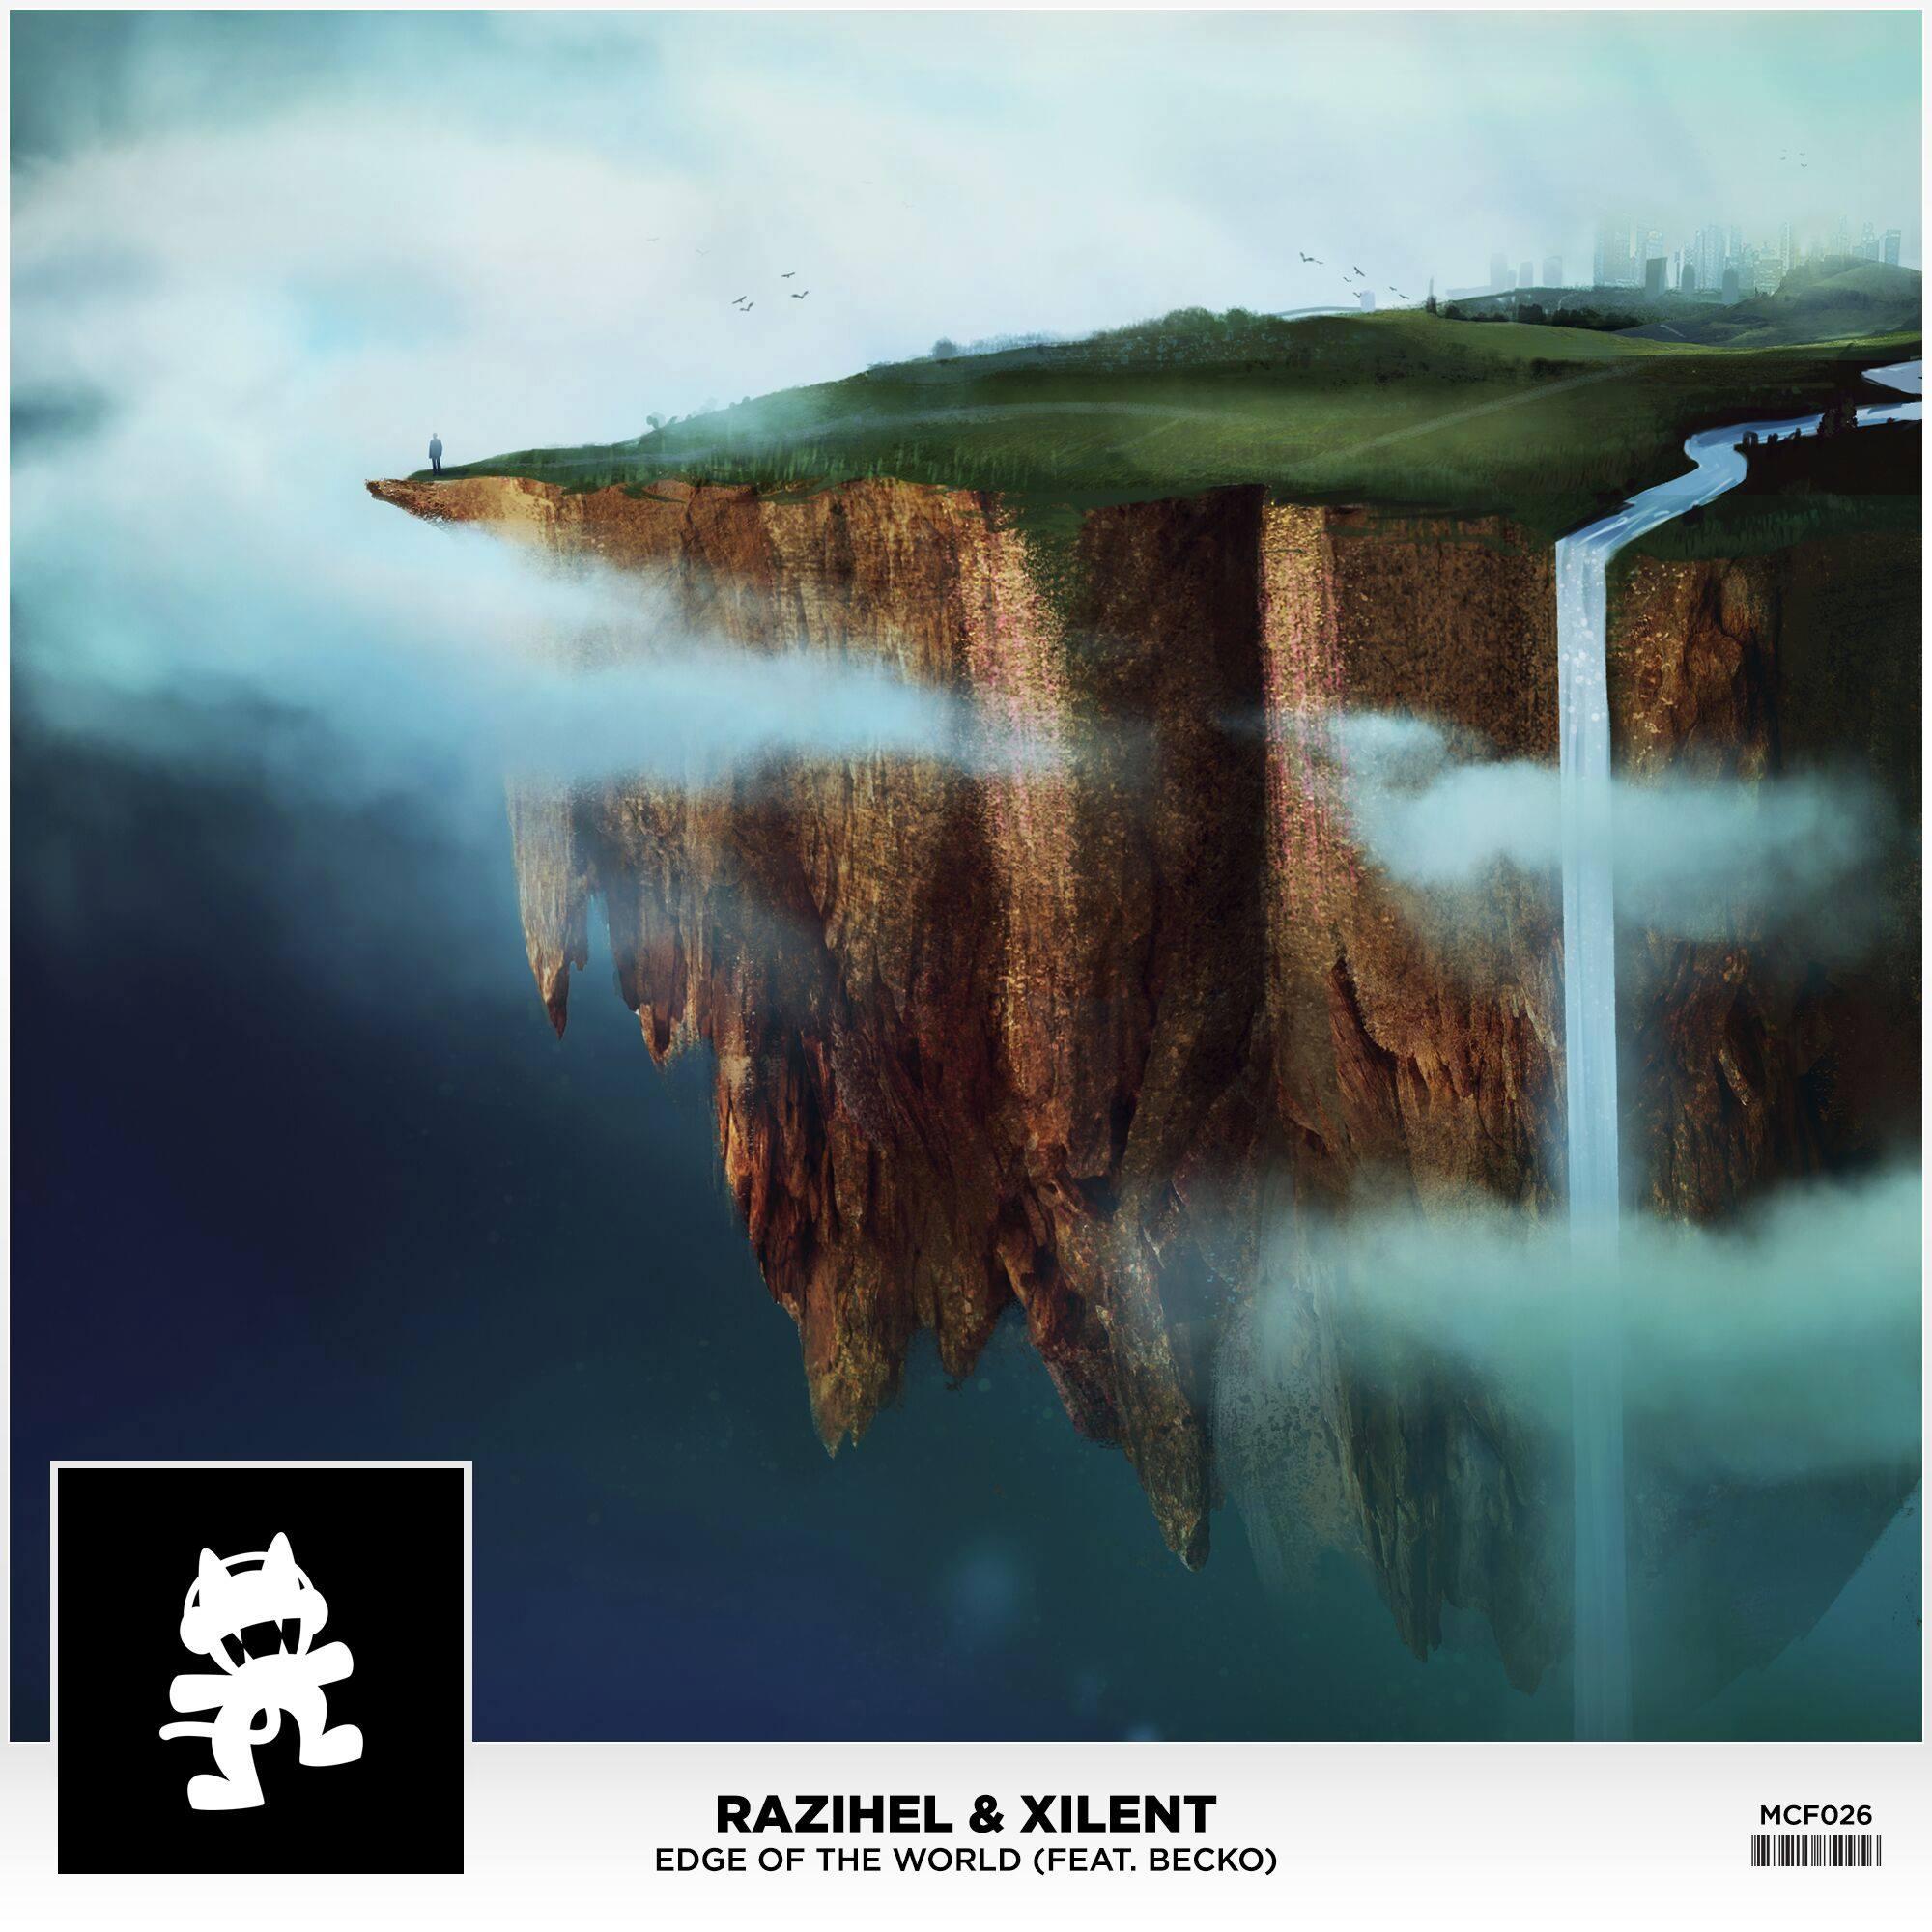 Edge of the World (Razihel & Xilent)